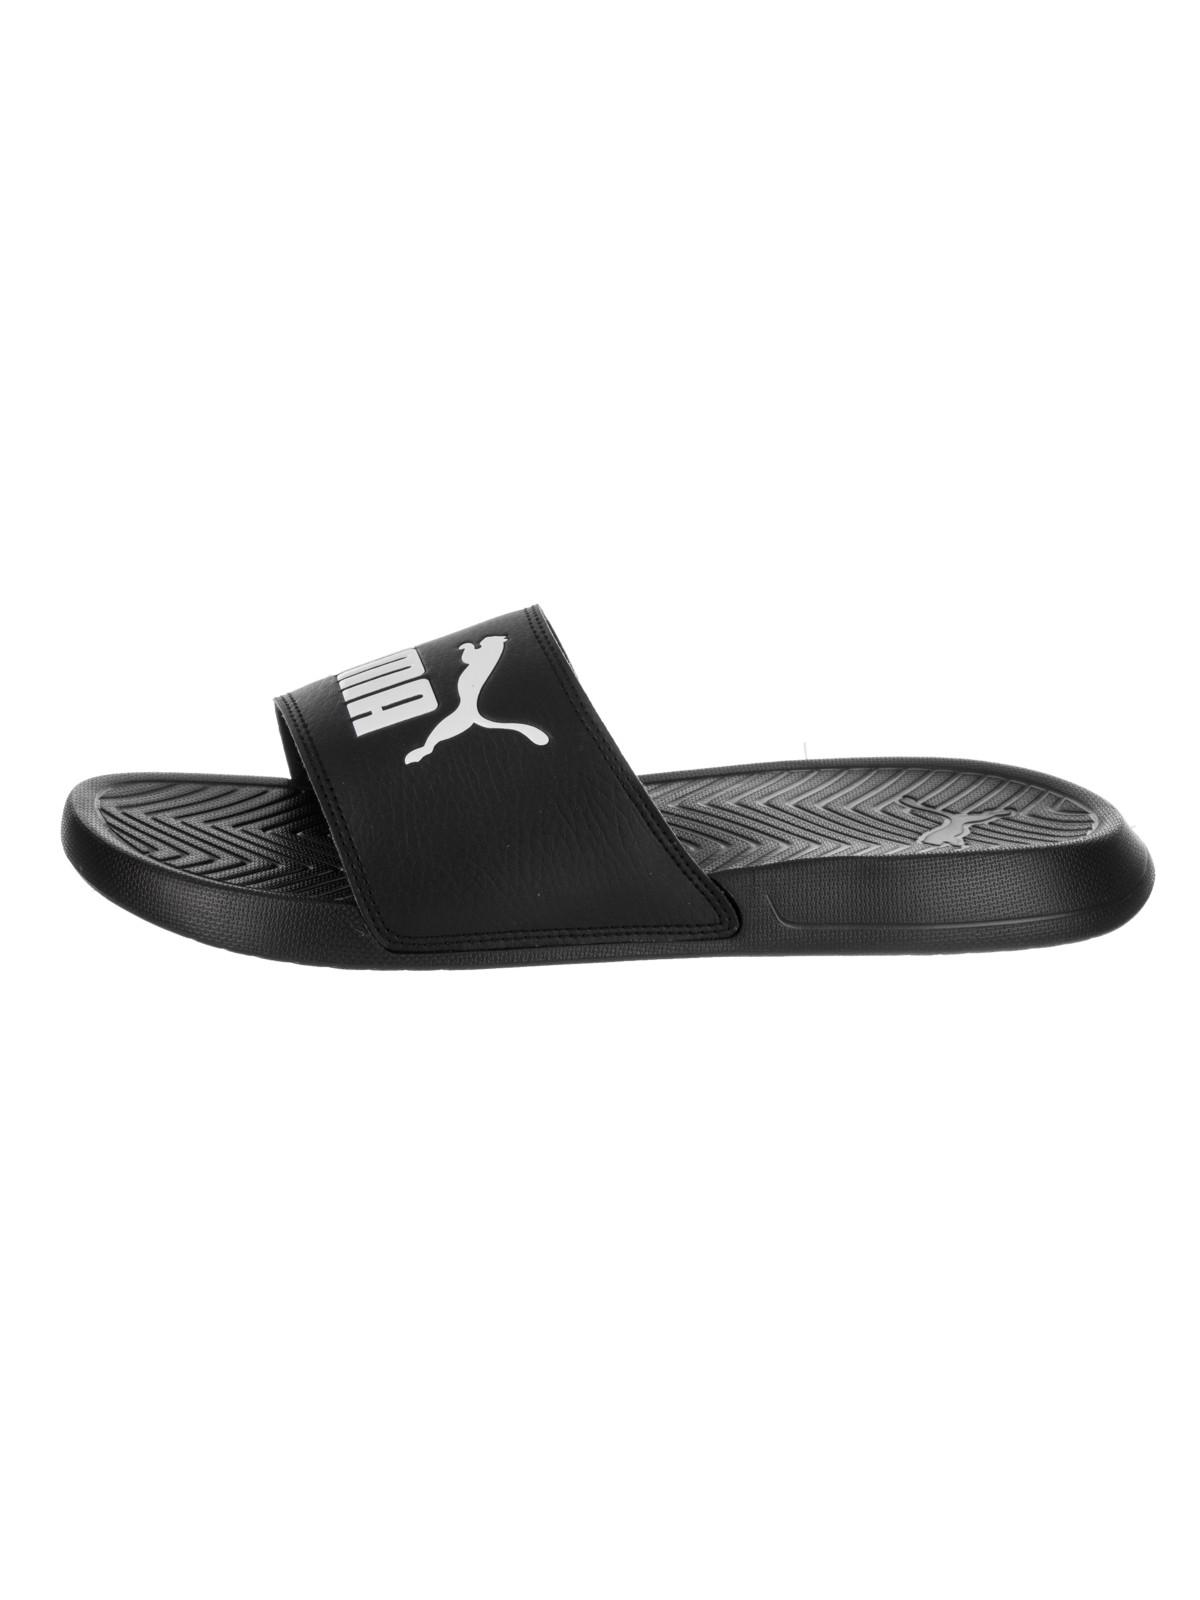 69721fa7133 PUMA - Puma Mens Popcat Lightweight Pool Slide Slide Sandals - Walmart.com